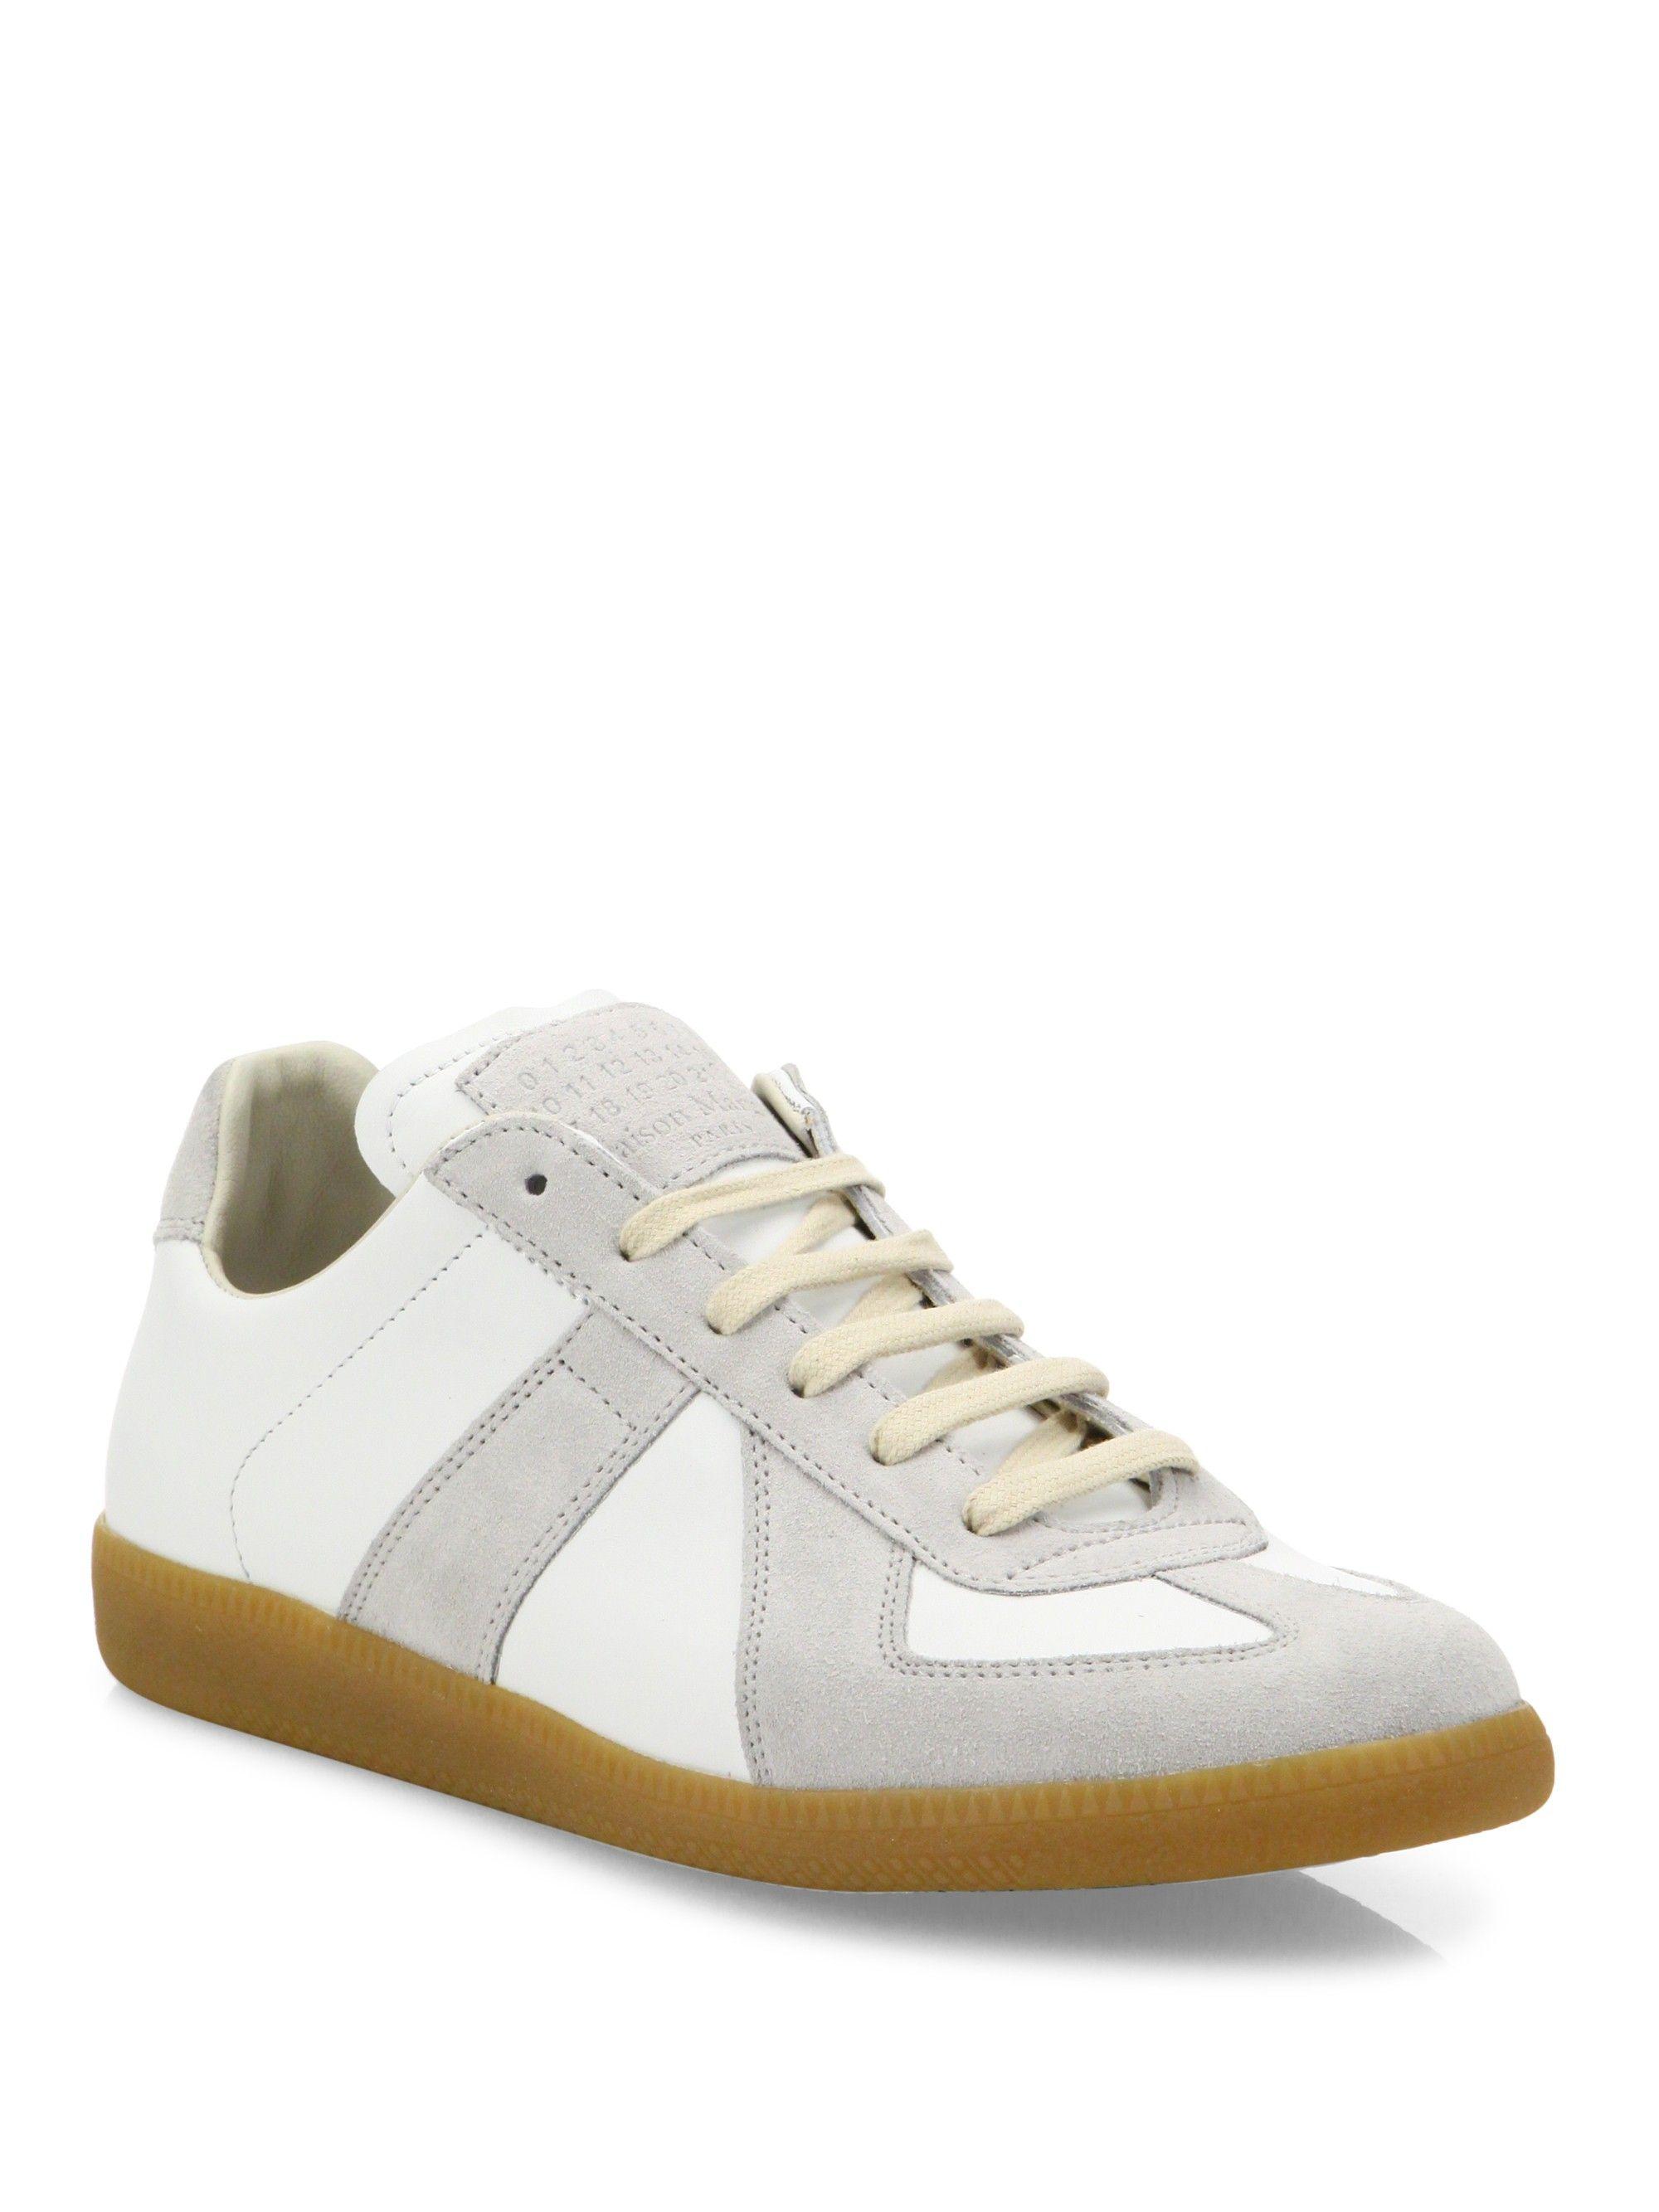 7674c426d67 Maison Margiela Replica Leather & Suede Low-Top Sneakers - Blue 41 ...